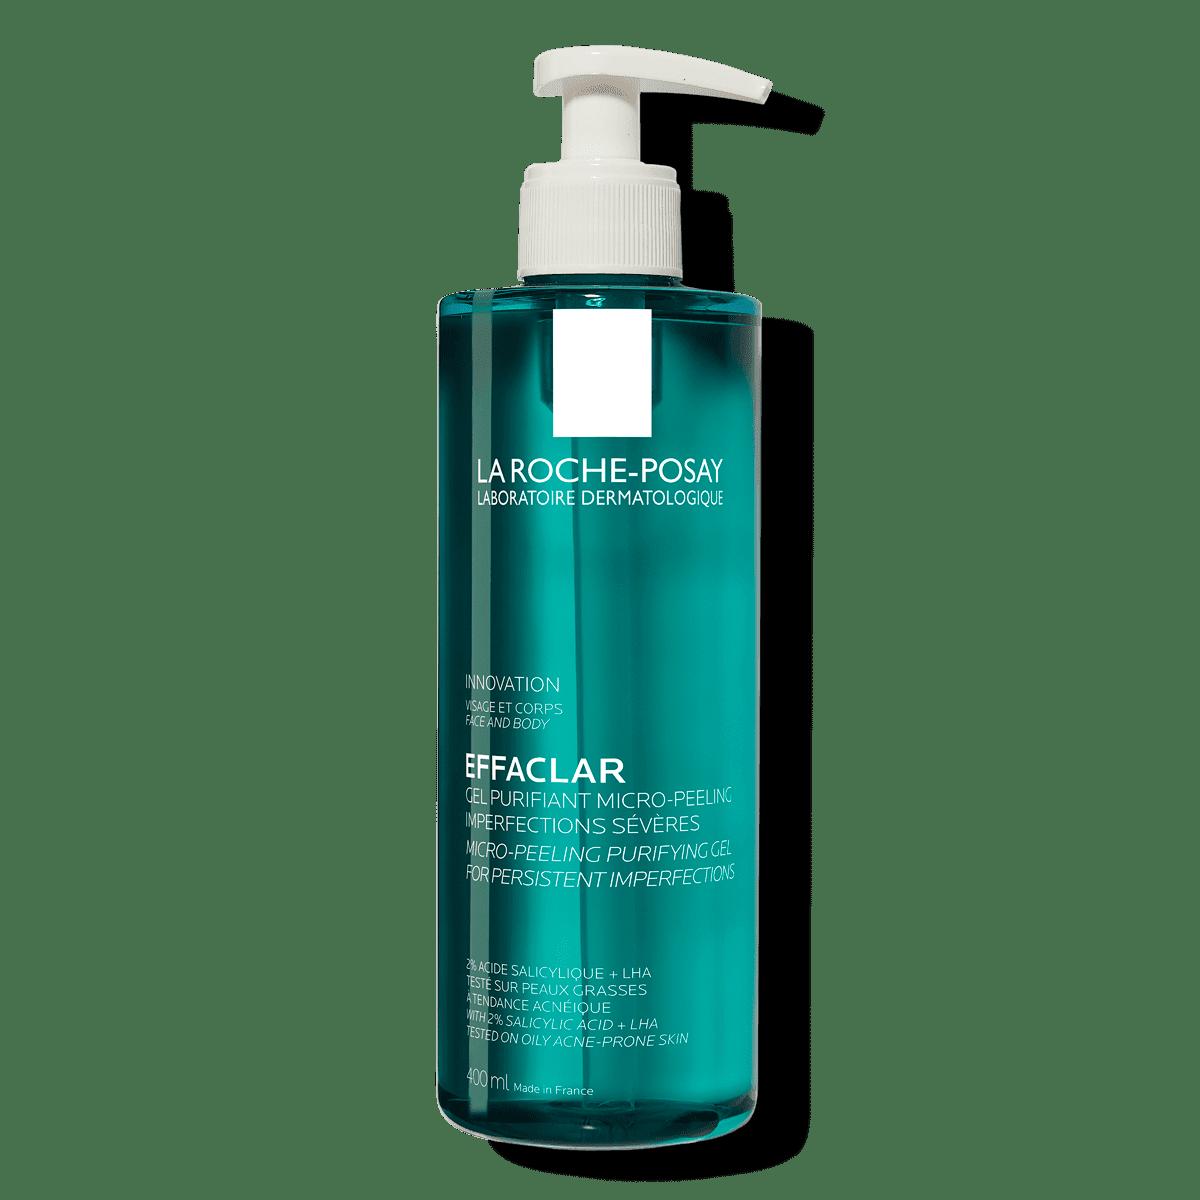 Effaclar Micro Peeling Purifying Gel 400ml 2% Salicylic Acid Oily Skin FSS